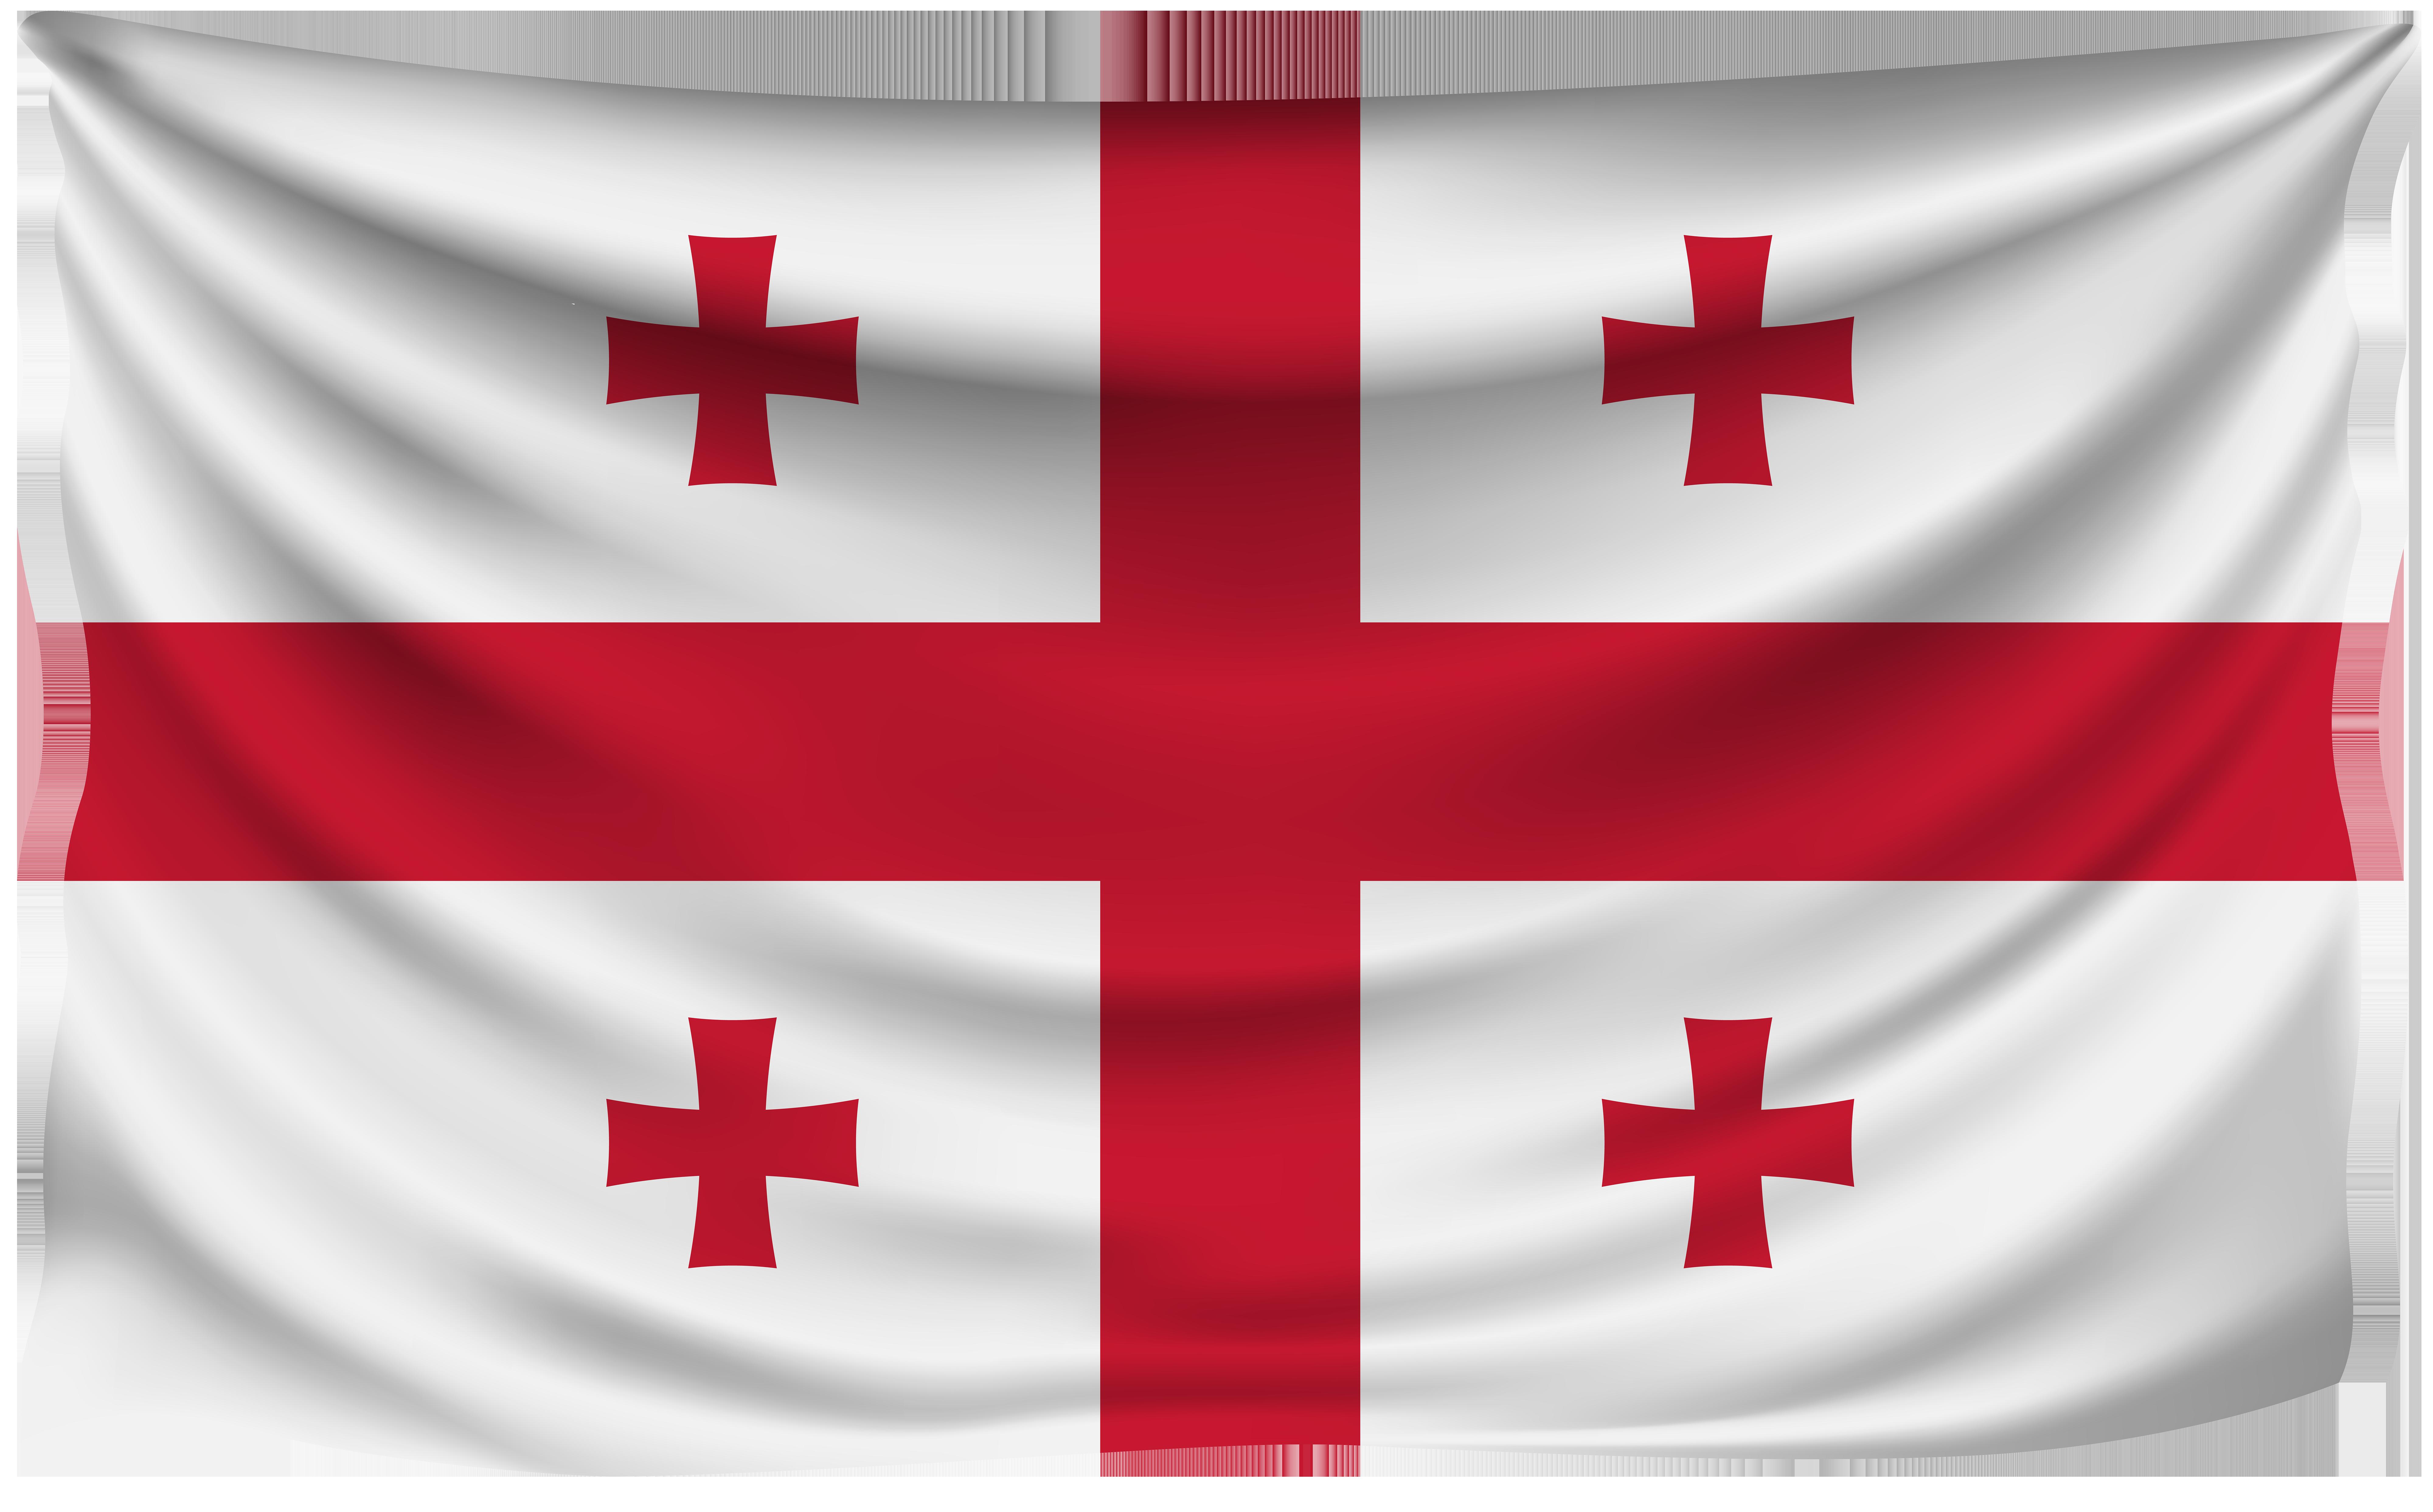 Cross flag clipart jpg transparent stock Georgia Wrinkled Flag | Gallery Yopriceville - High-Quality Images ... jpg transparent stock